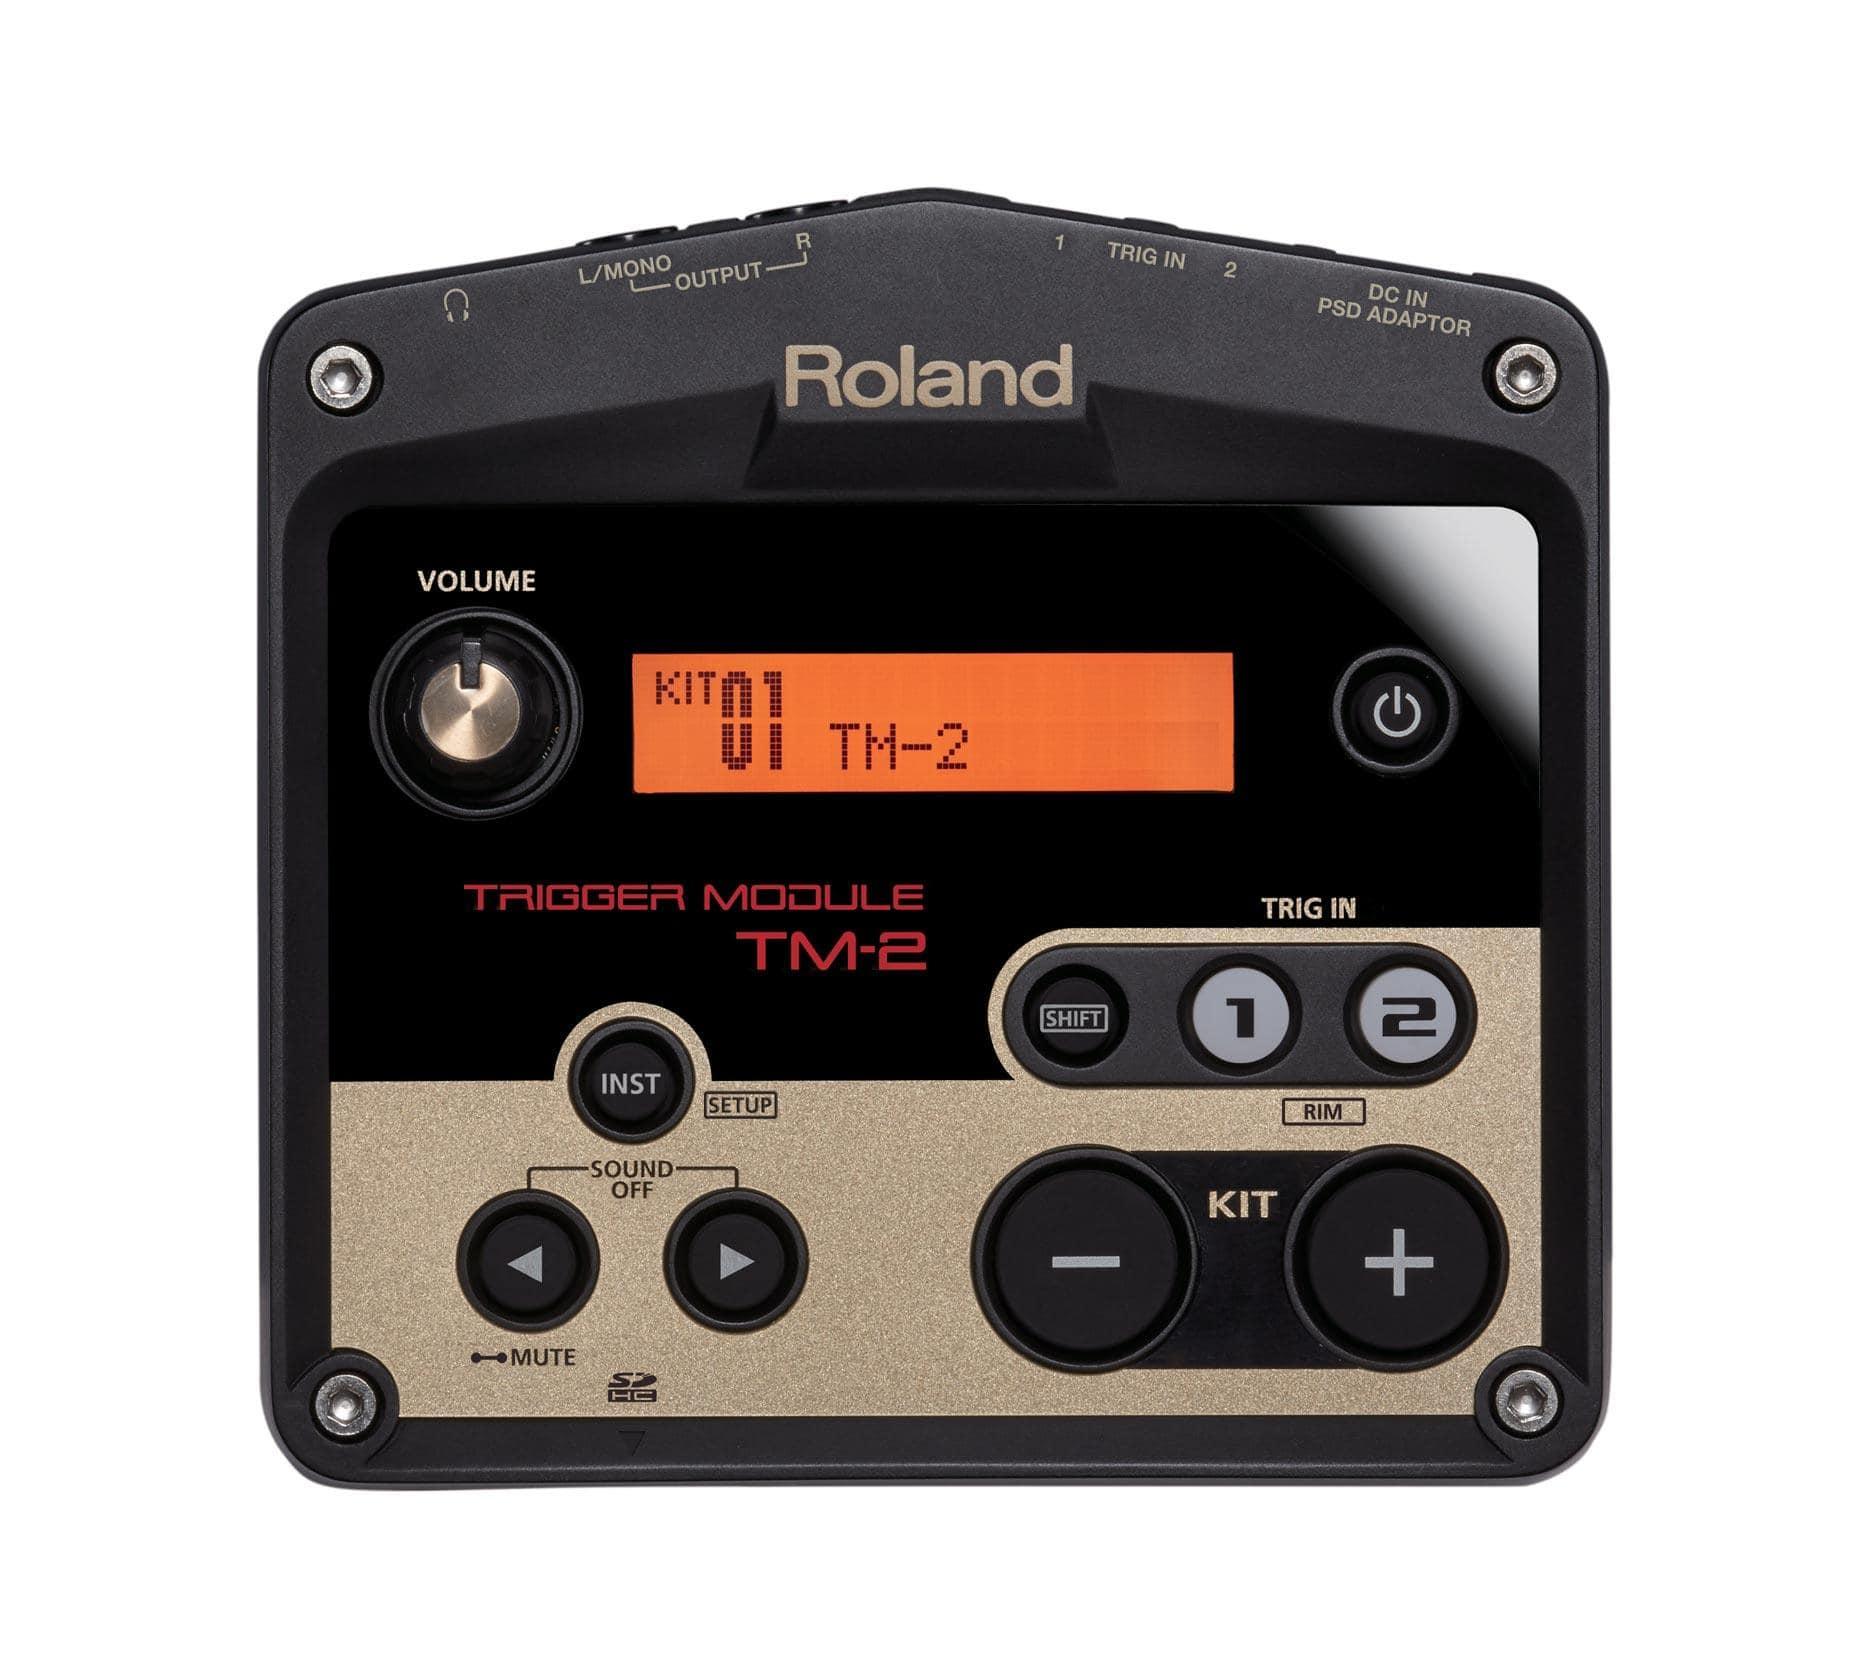 roland tm 2 drum trigger modul mit sounds 2 trigger inputs kirstein music shop. Black Bedroom Furniture Sets. Home Design Ideas